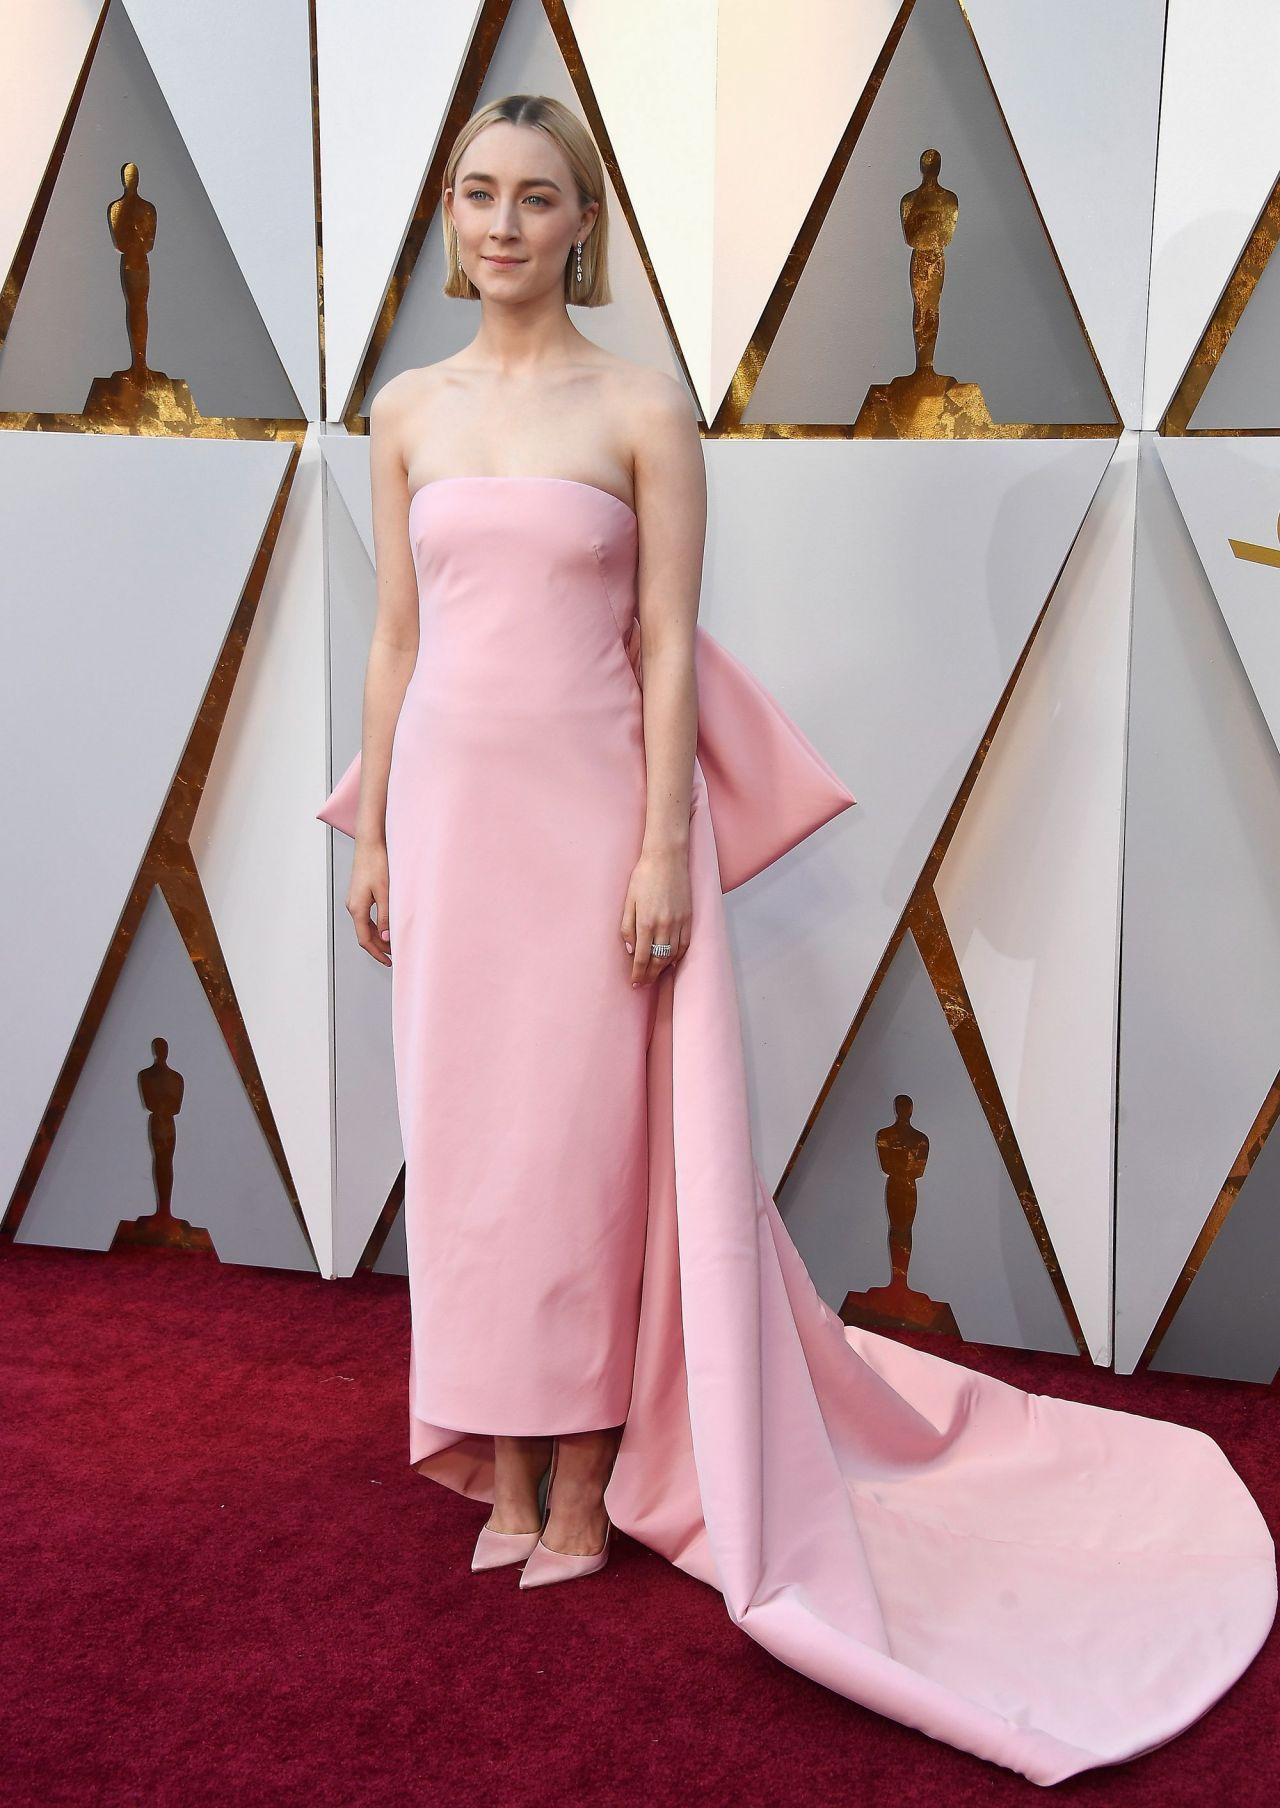 http://celebmafia.com/wp-content/uploads/2018/03/saoirse-ronan-oscars-2018-red-carpet-8.jpg